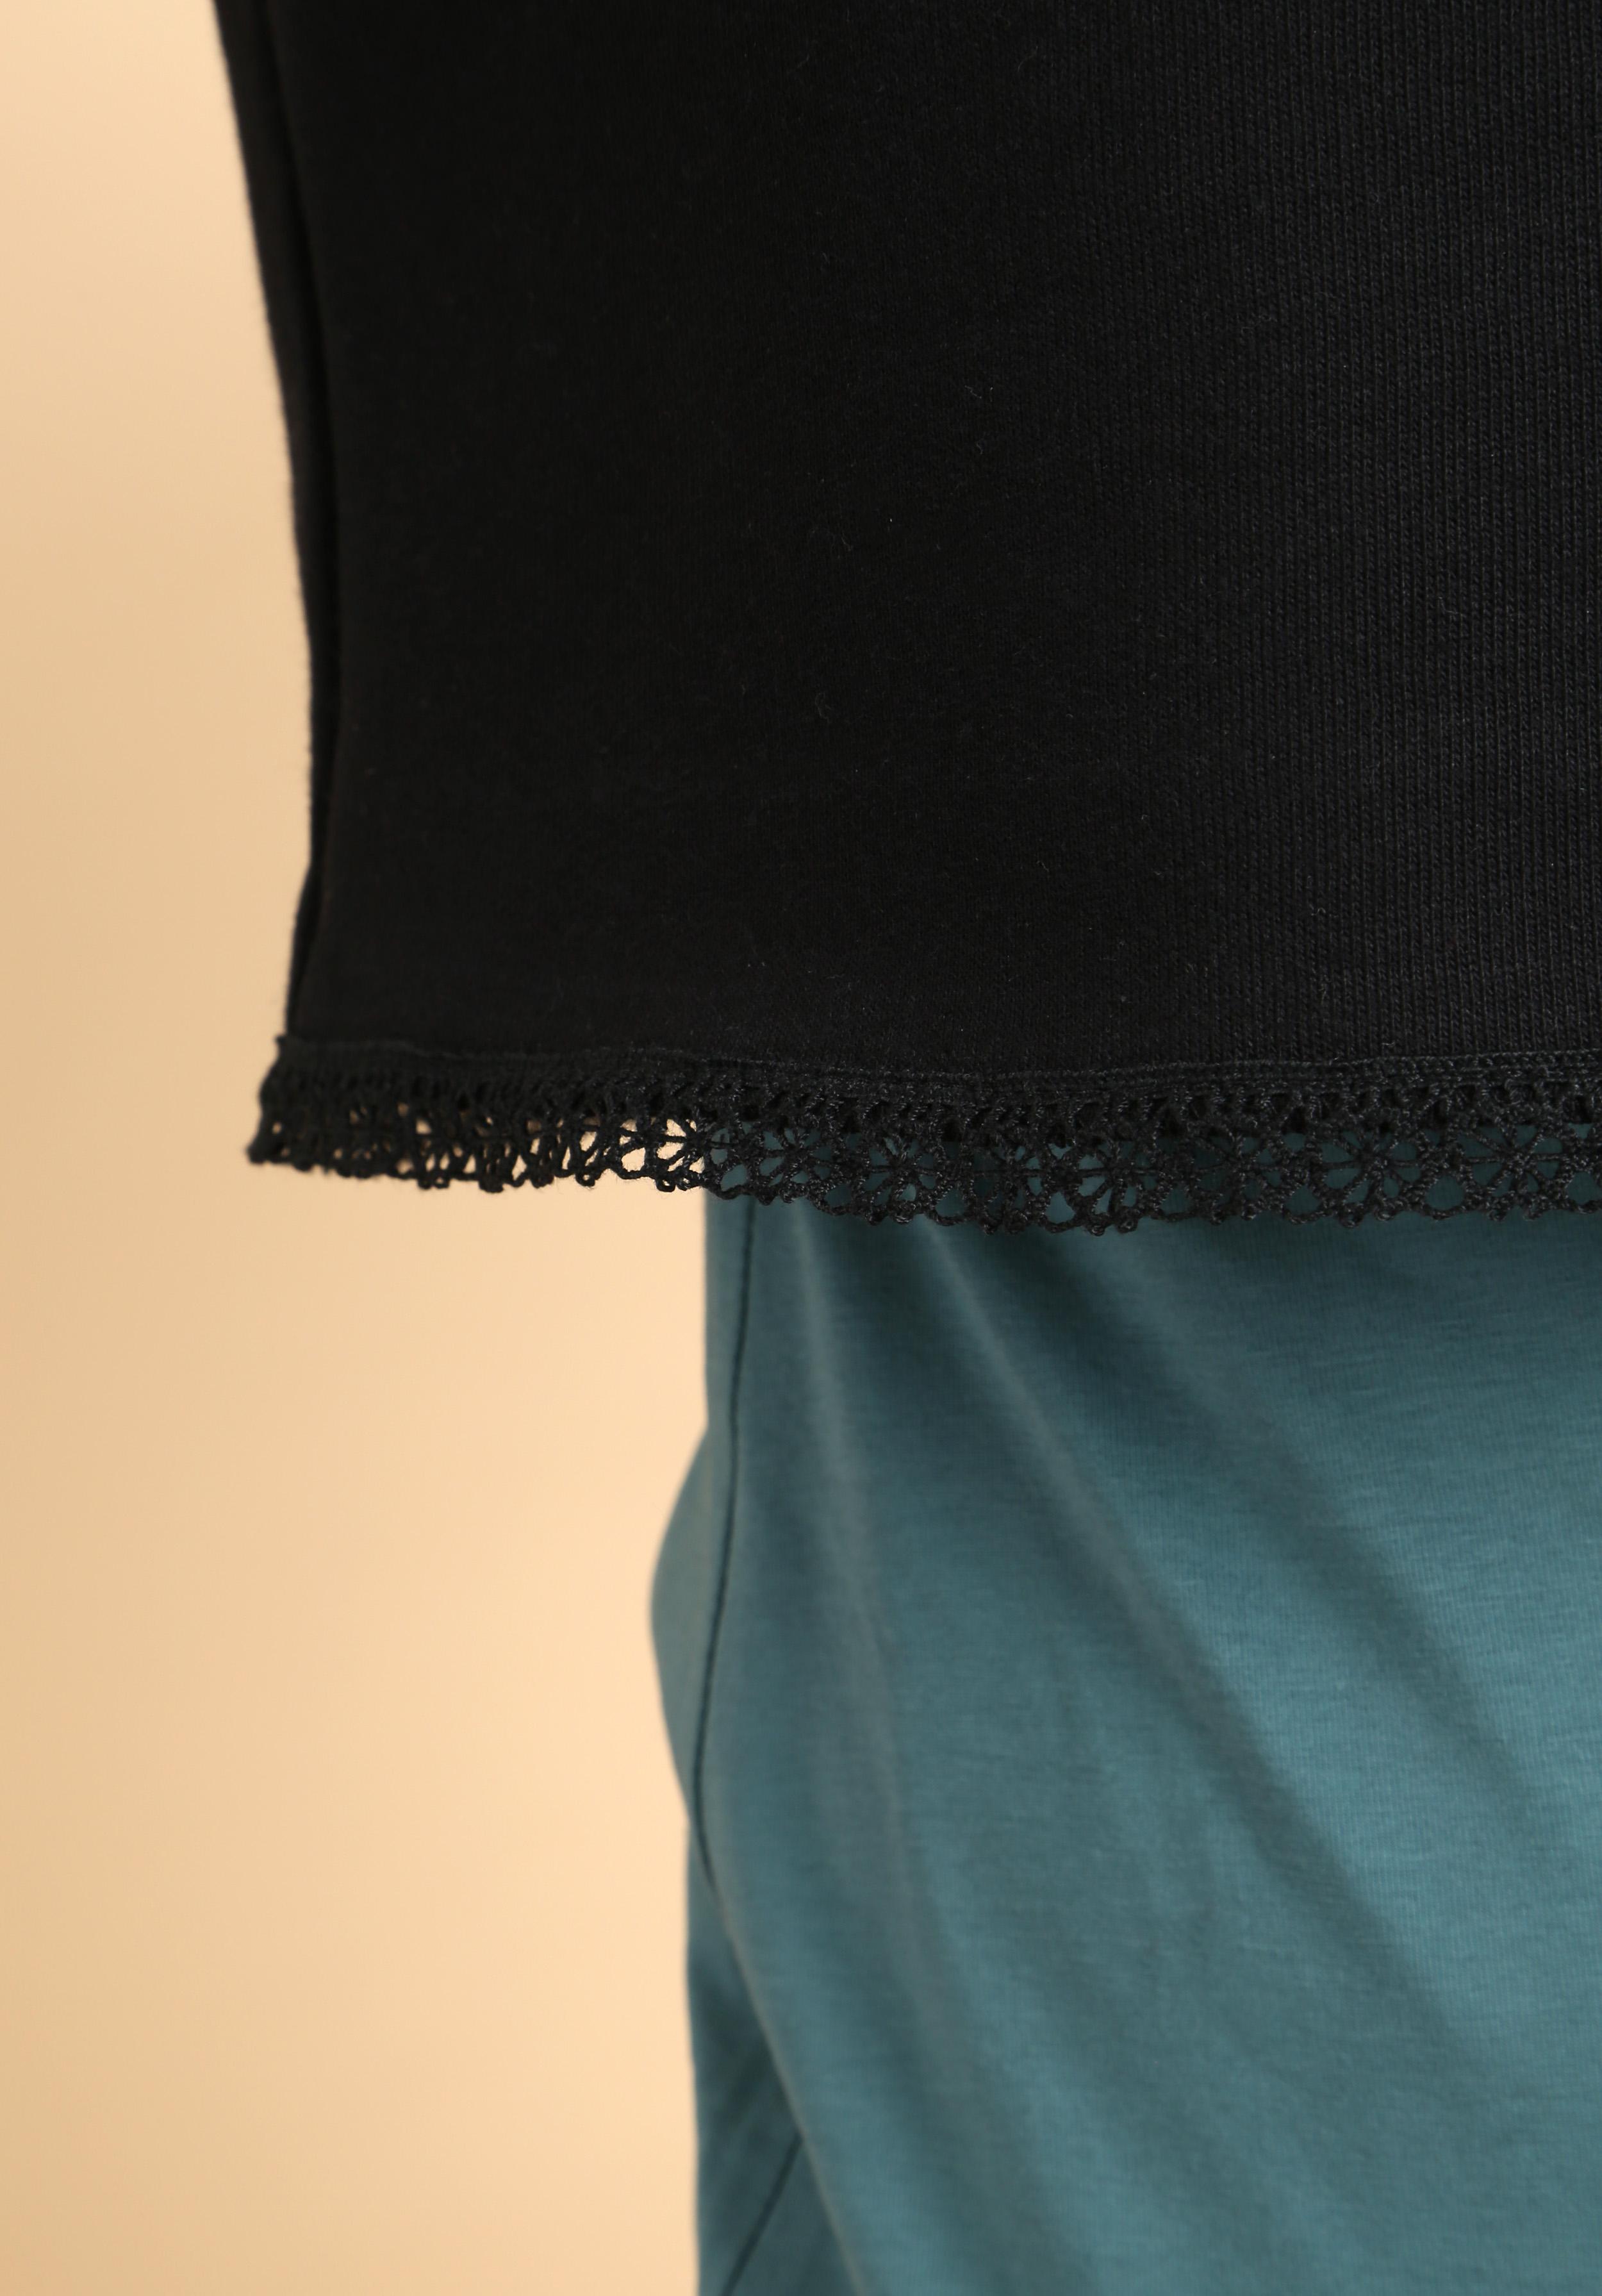 Kurzsweater Schwarz